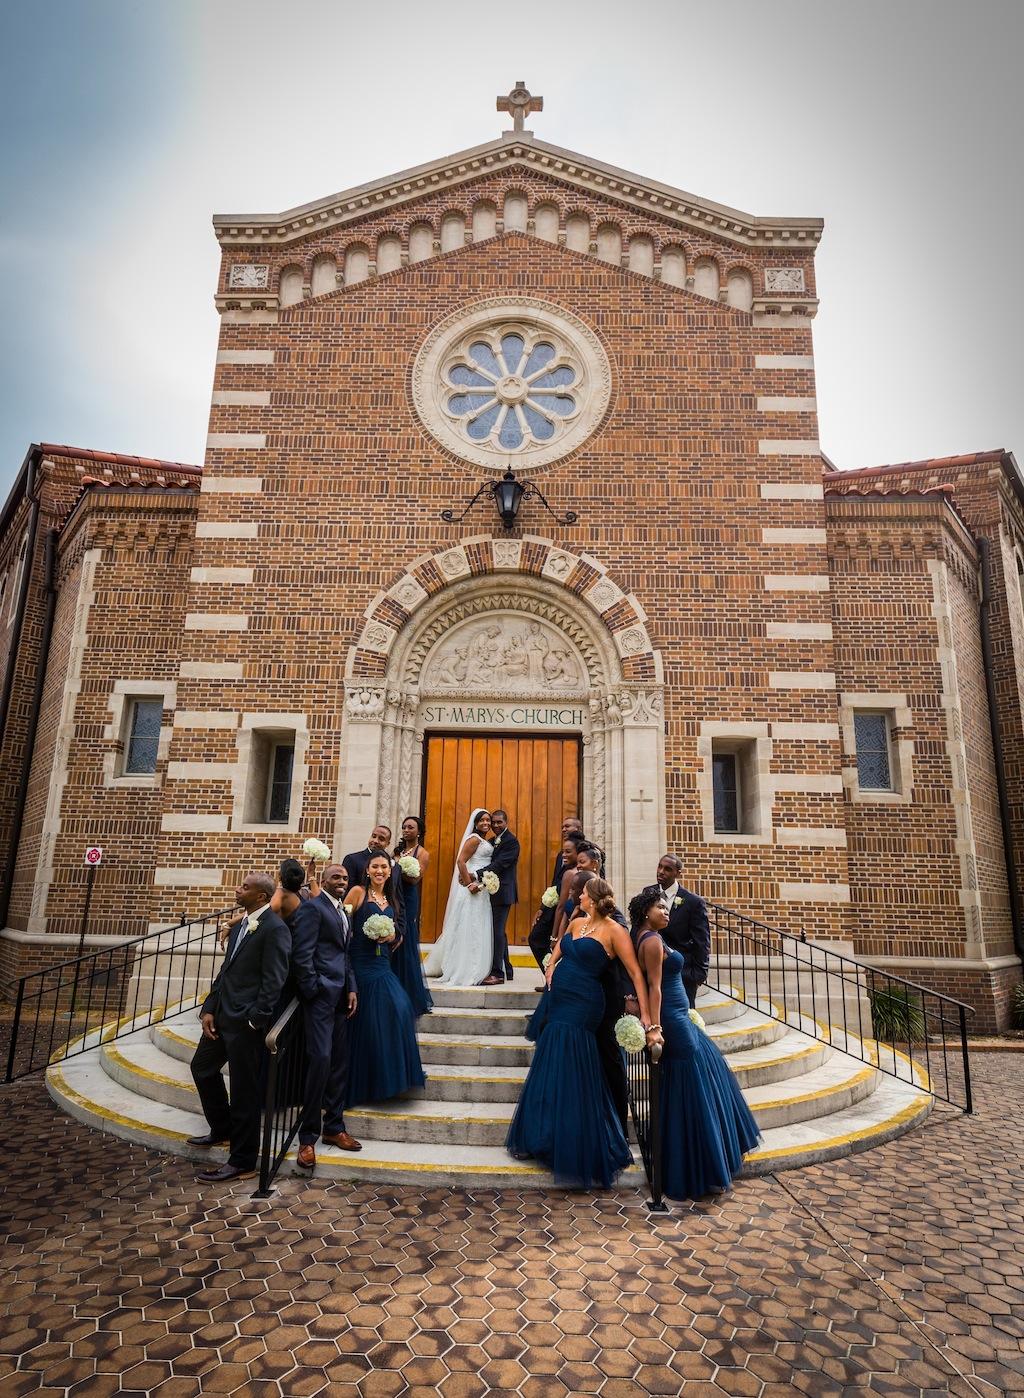 NOVA 535 Wedding - Midsummer Night's Dream Wedding in Downtown St. Pete by 28Pixels Photography (15)